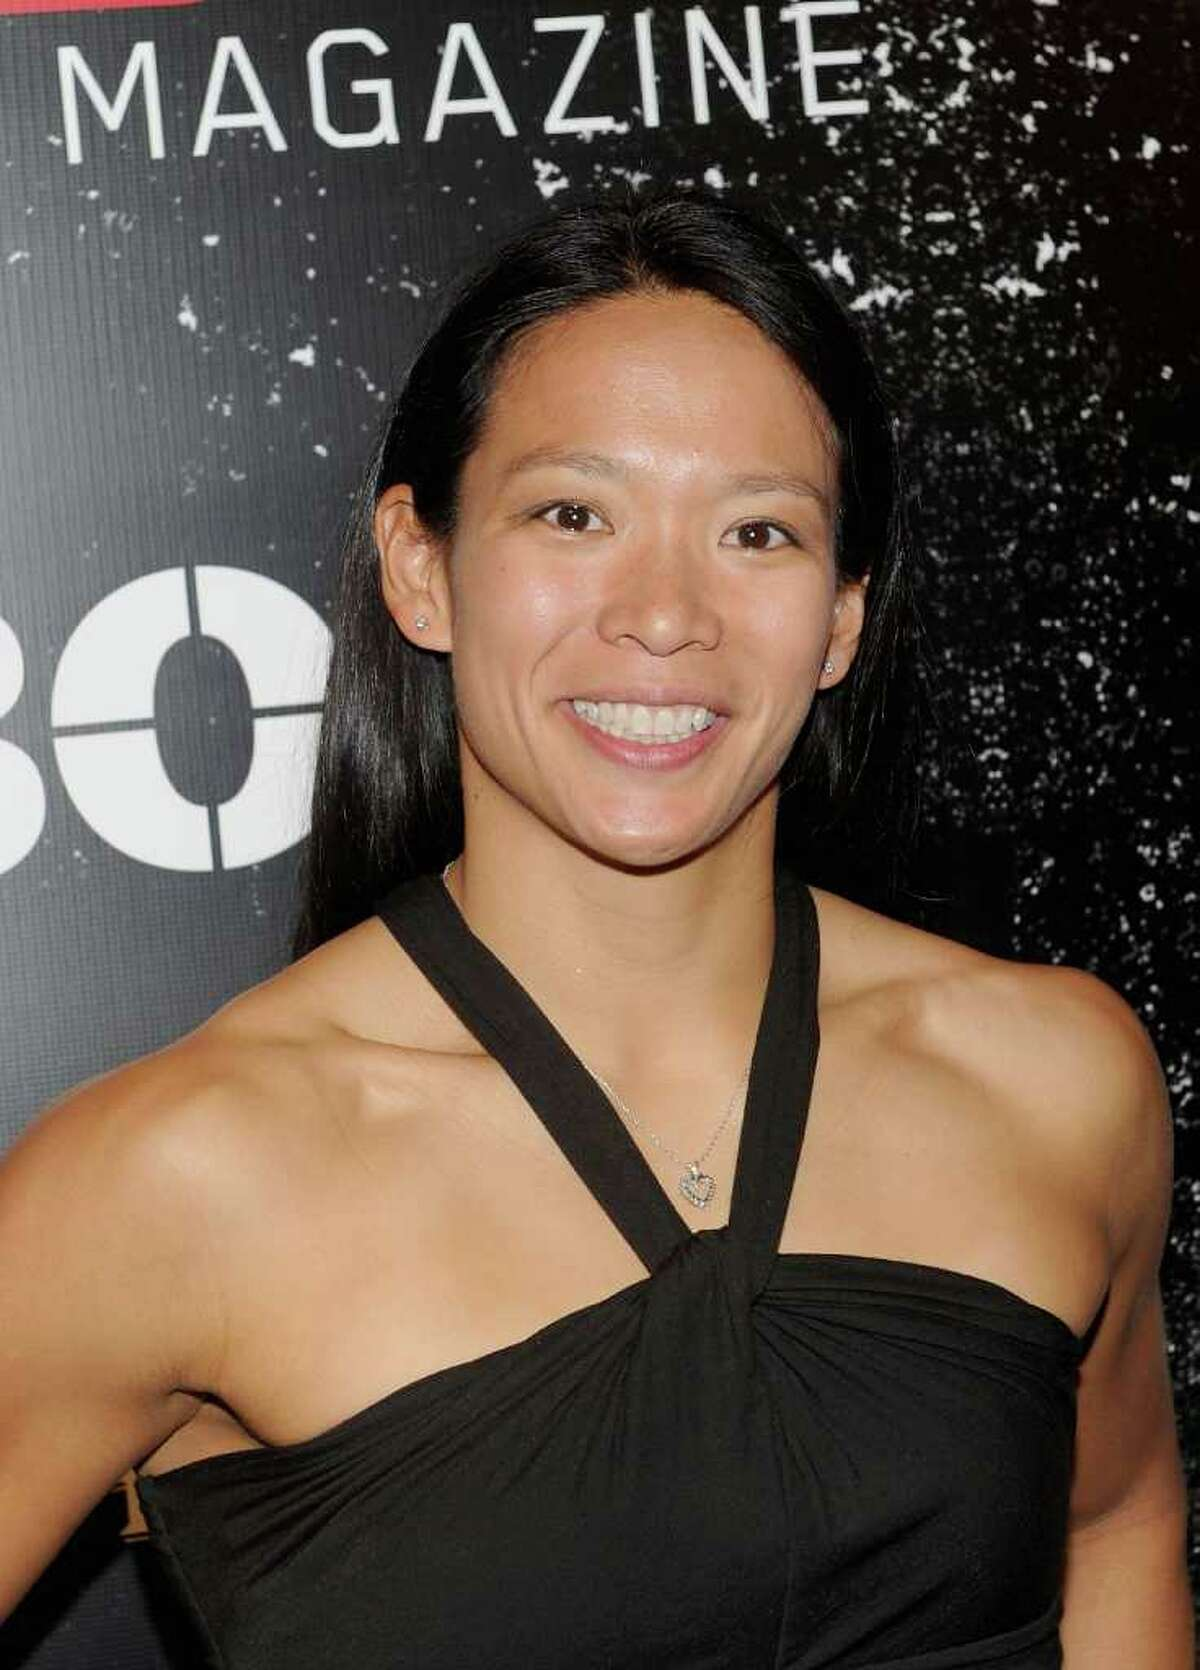 Fairfield's Julie Chu attends ESPN the Magazine's third annuall